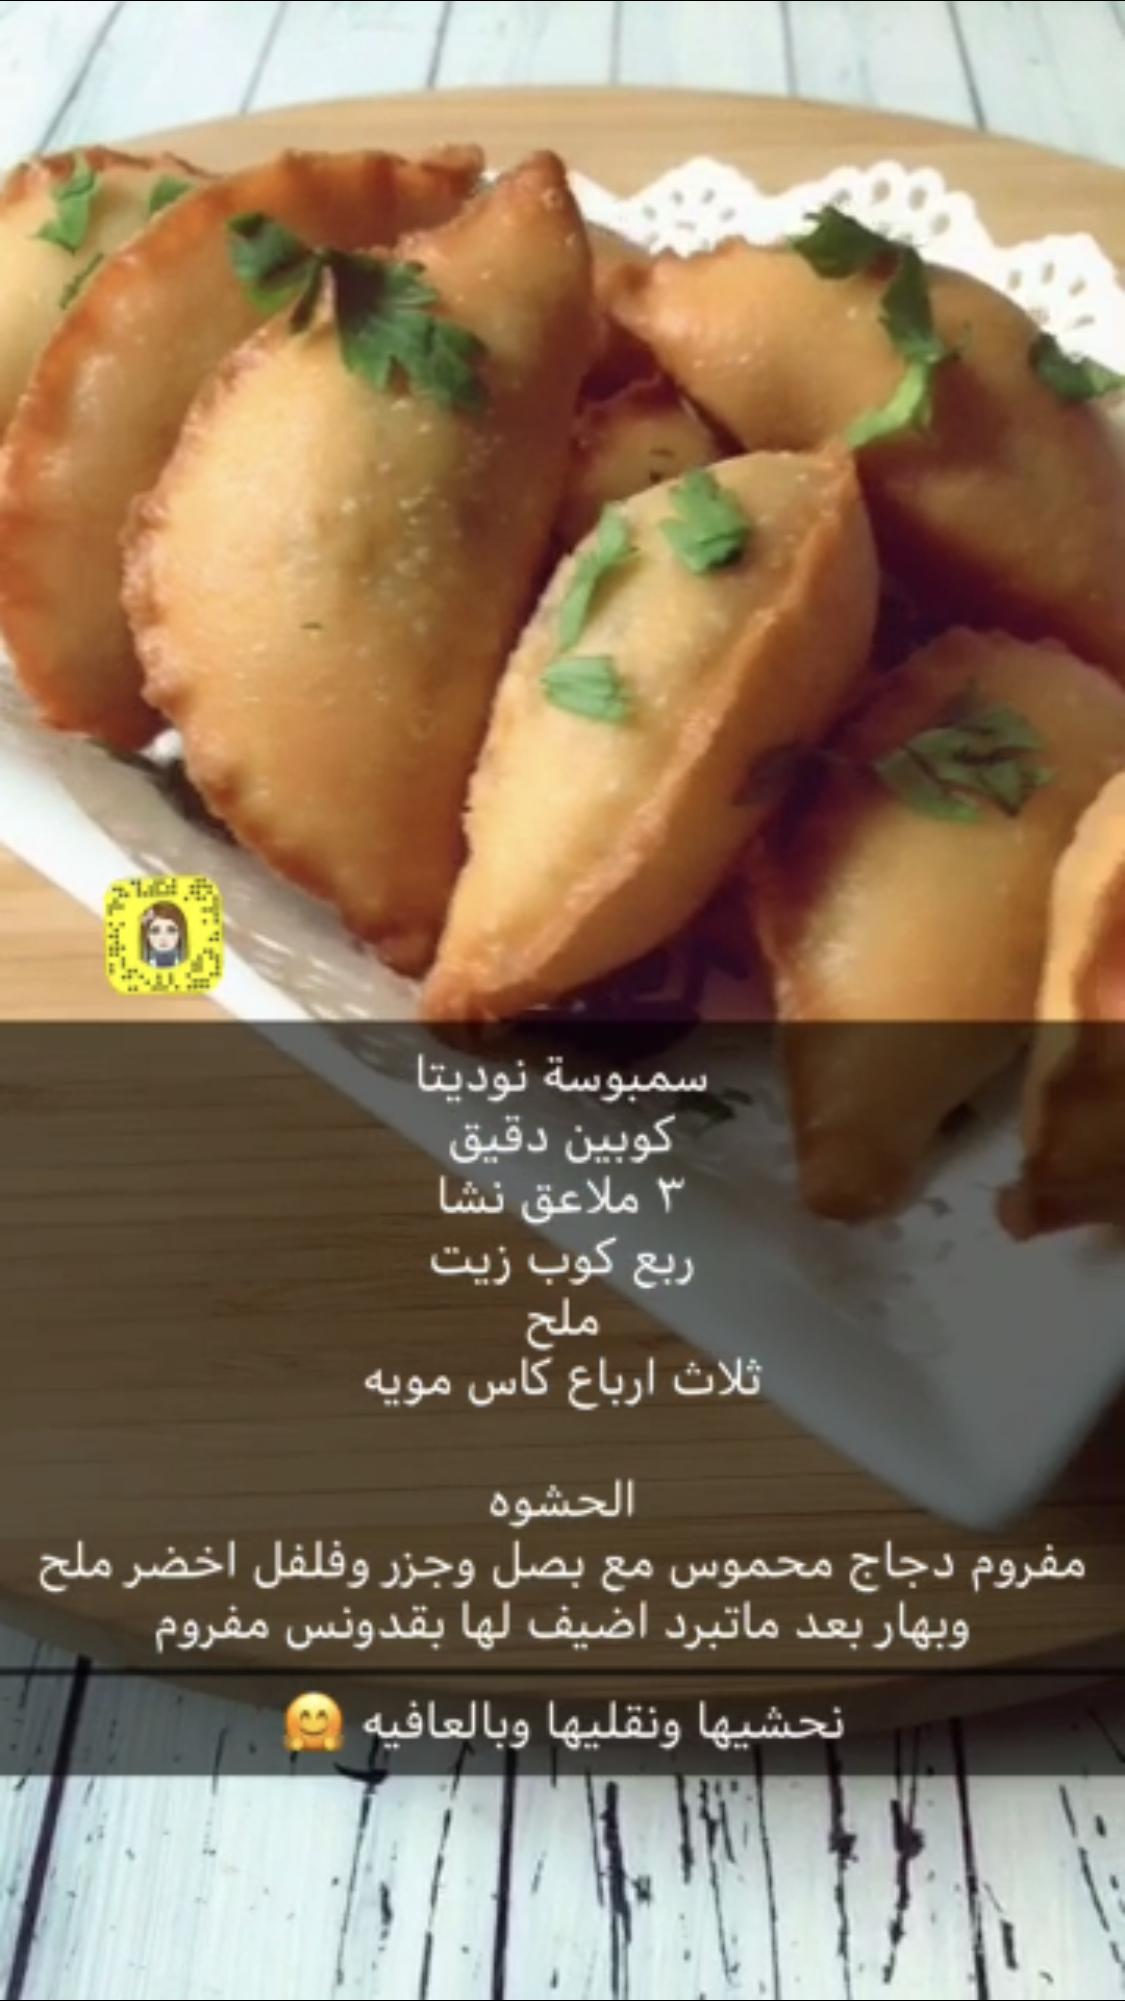 حشو قطائف مالحه Food Receipes Food Recipies Egyptian Food